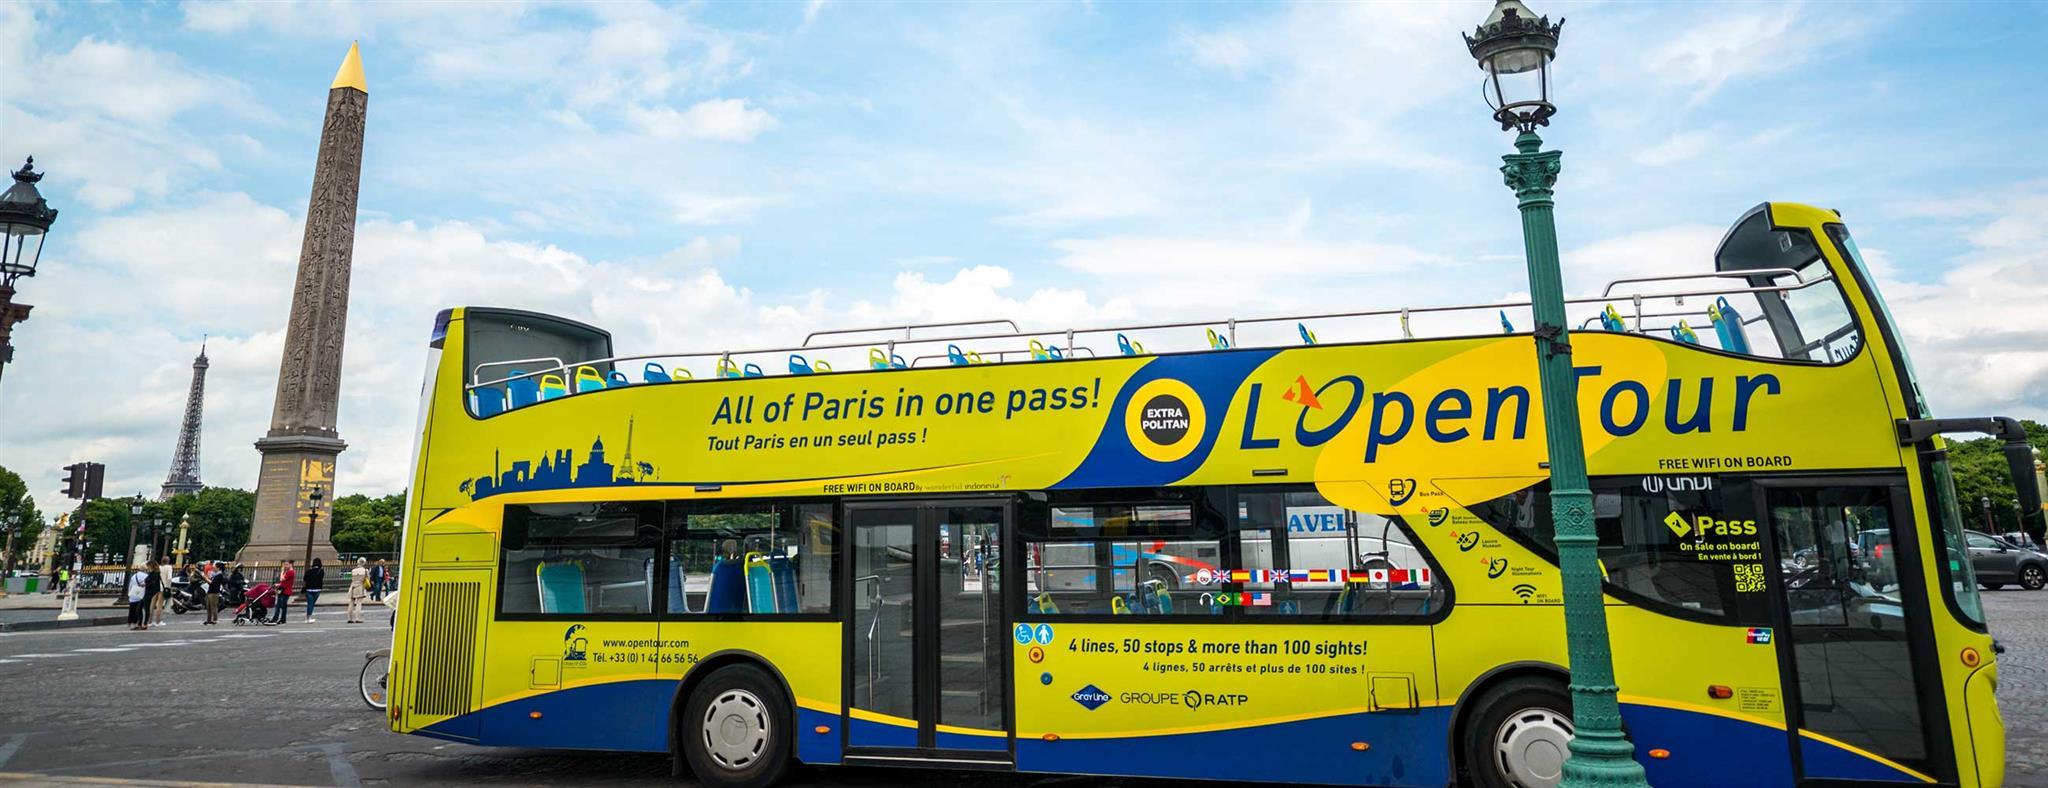 The-Advantages-Of-Using-Hop-On-Hop-Off-Bus-Tours